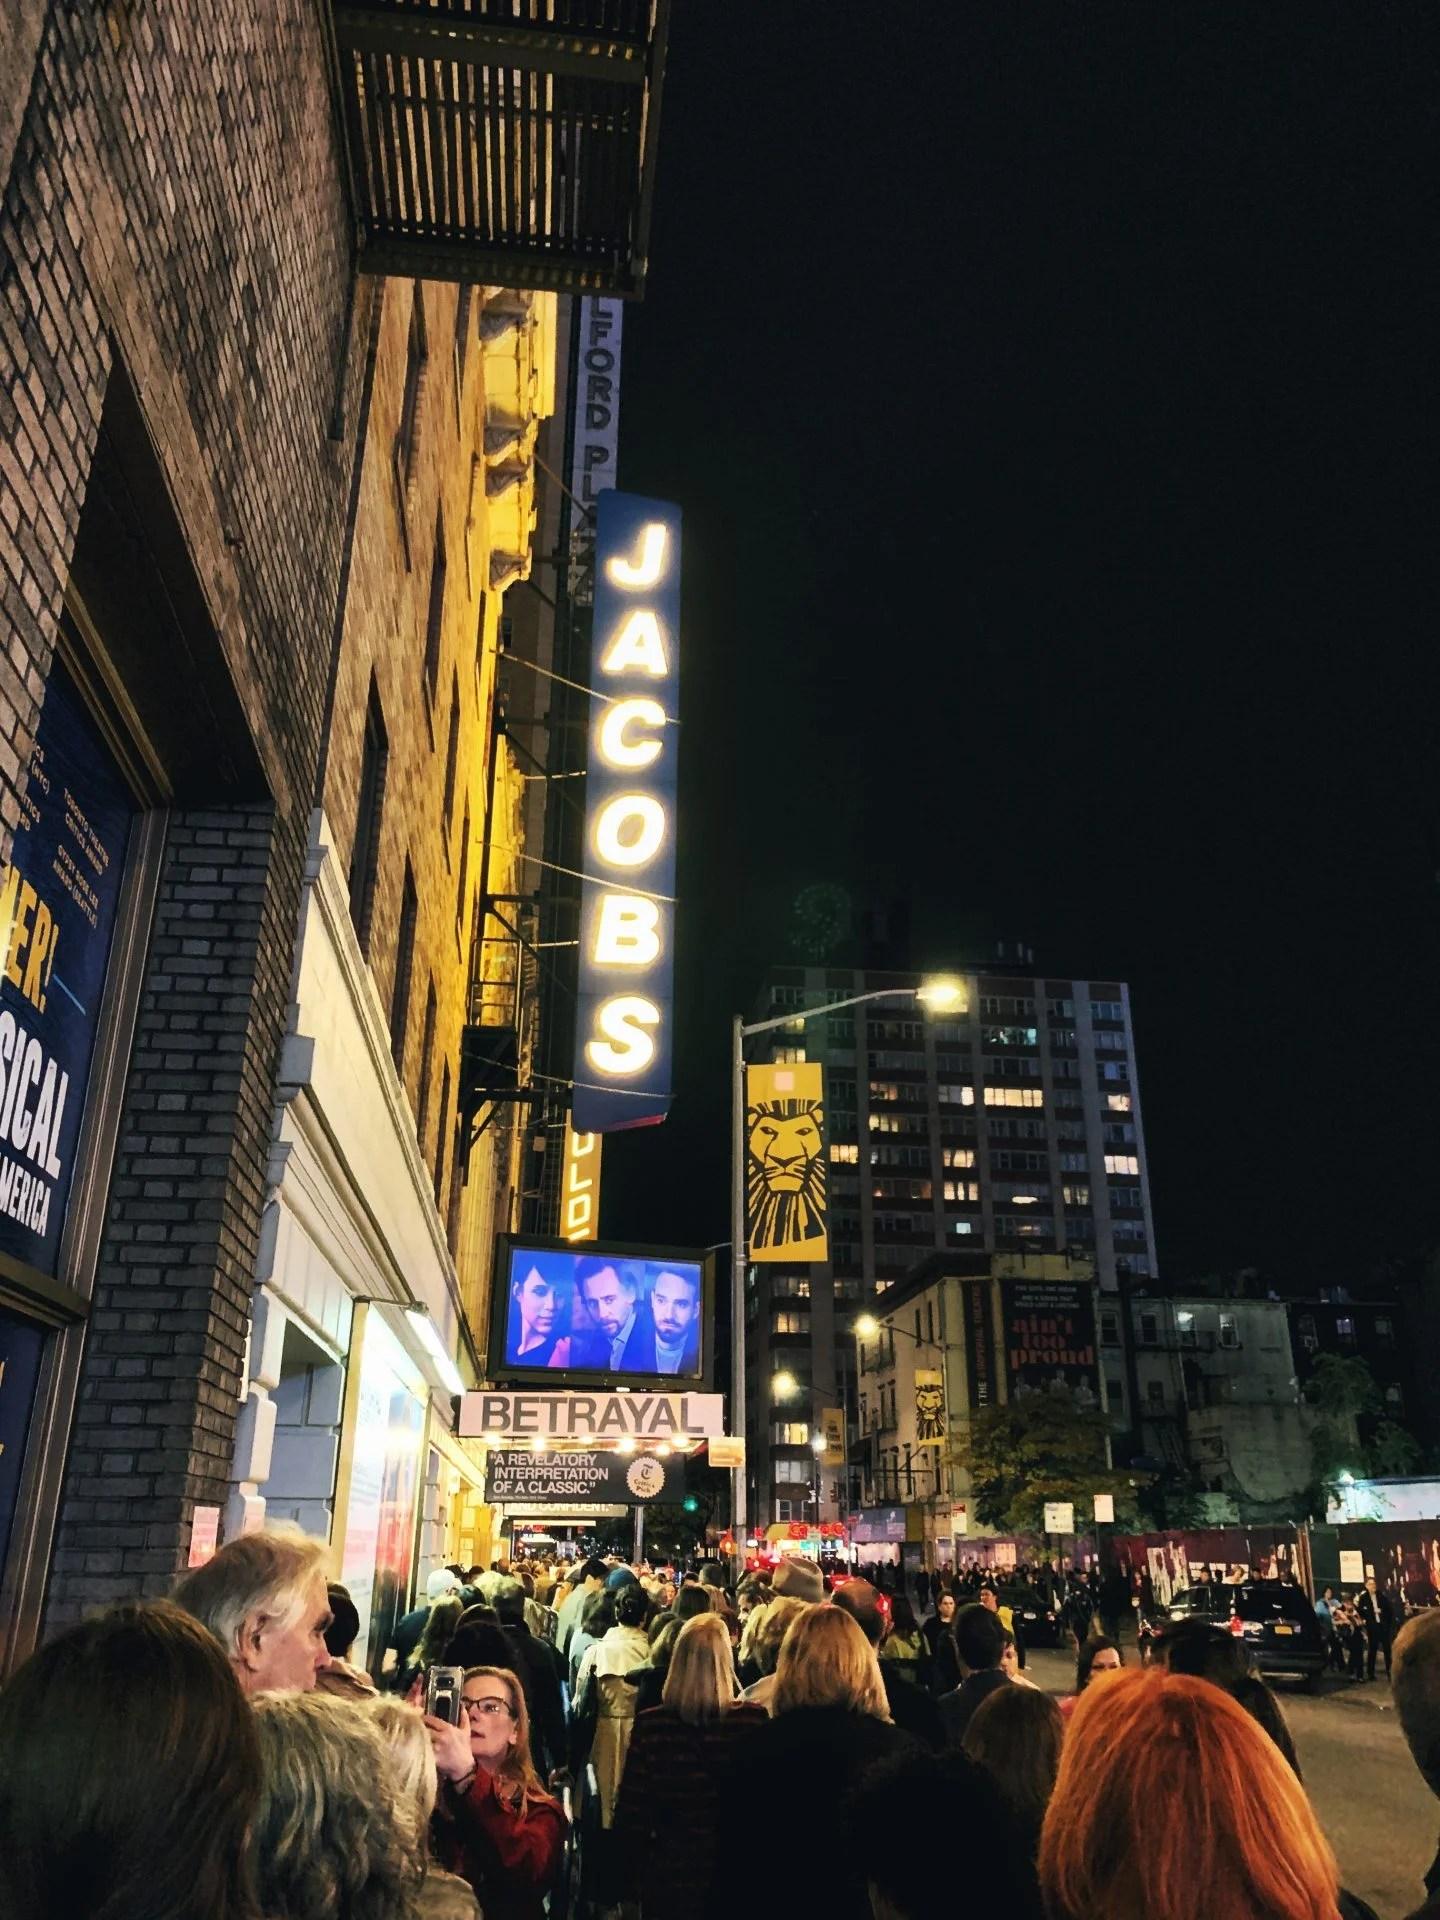 Broadway show Betrayal